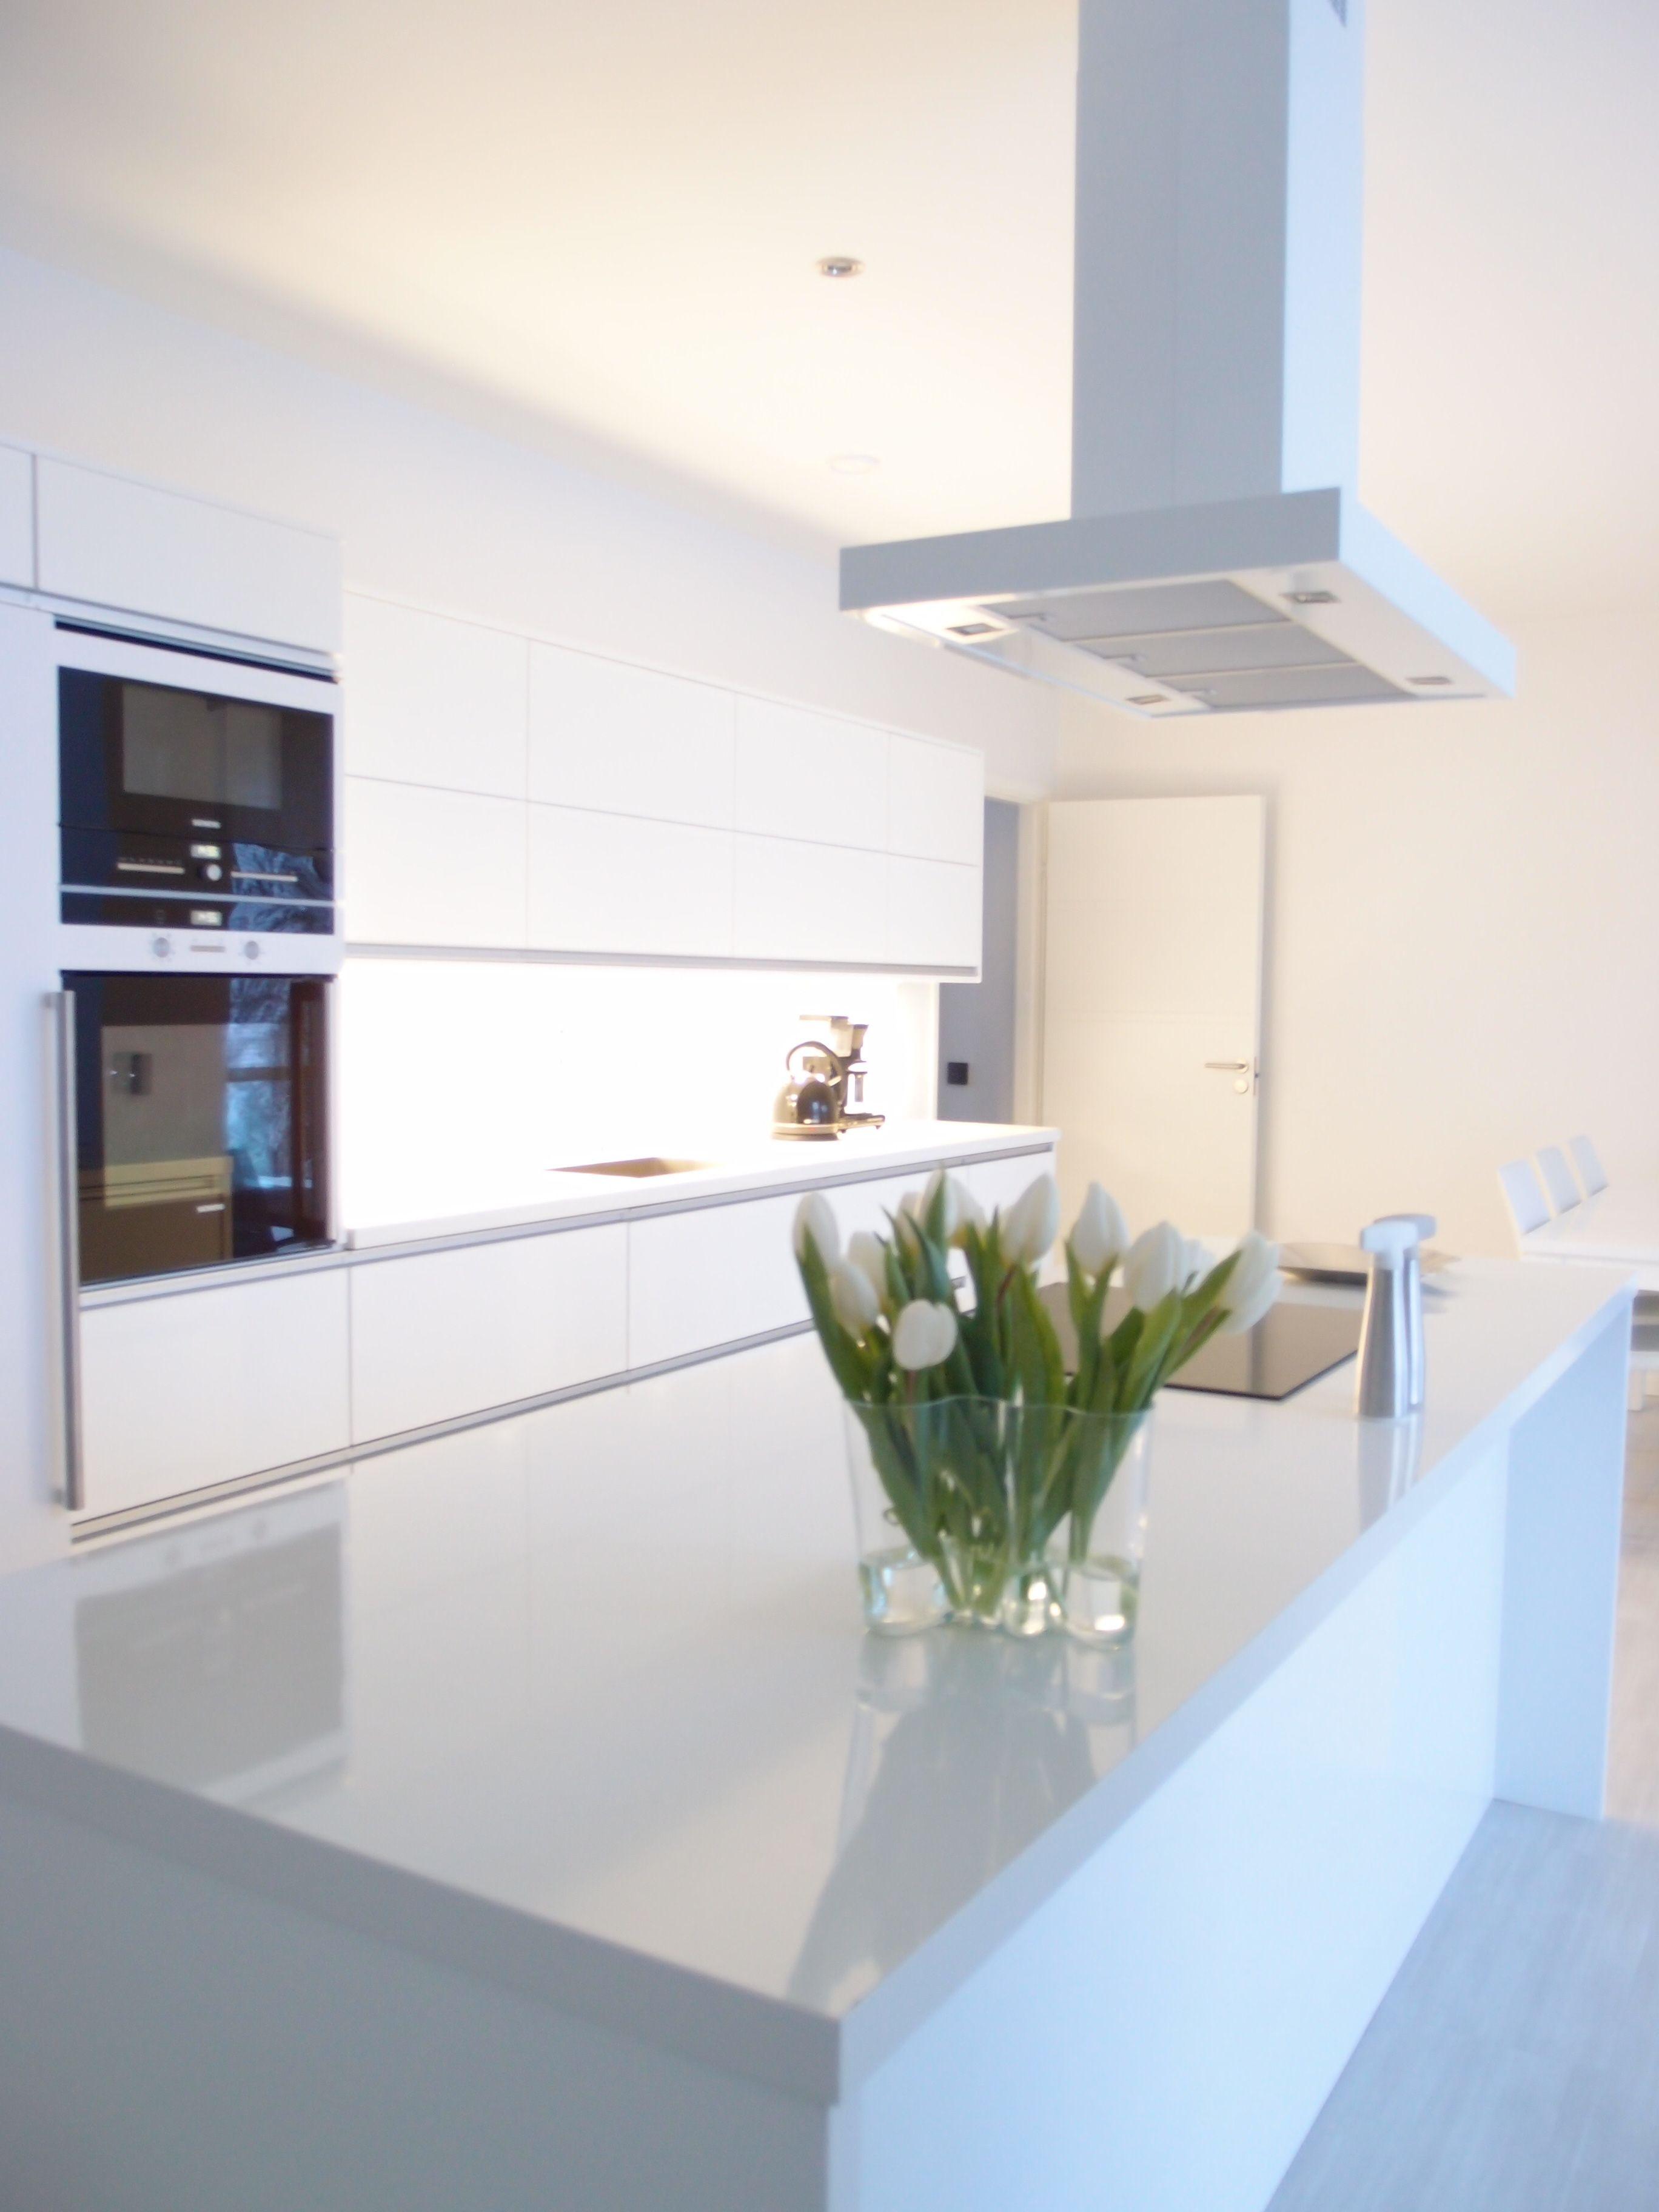 17 White Kitchen Designs Inspirations  부엌 아이디어, 모던 부엌 및 ...